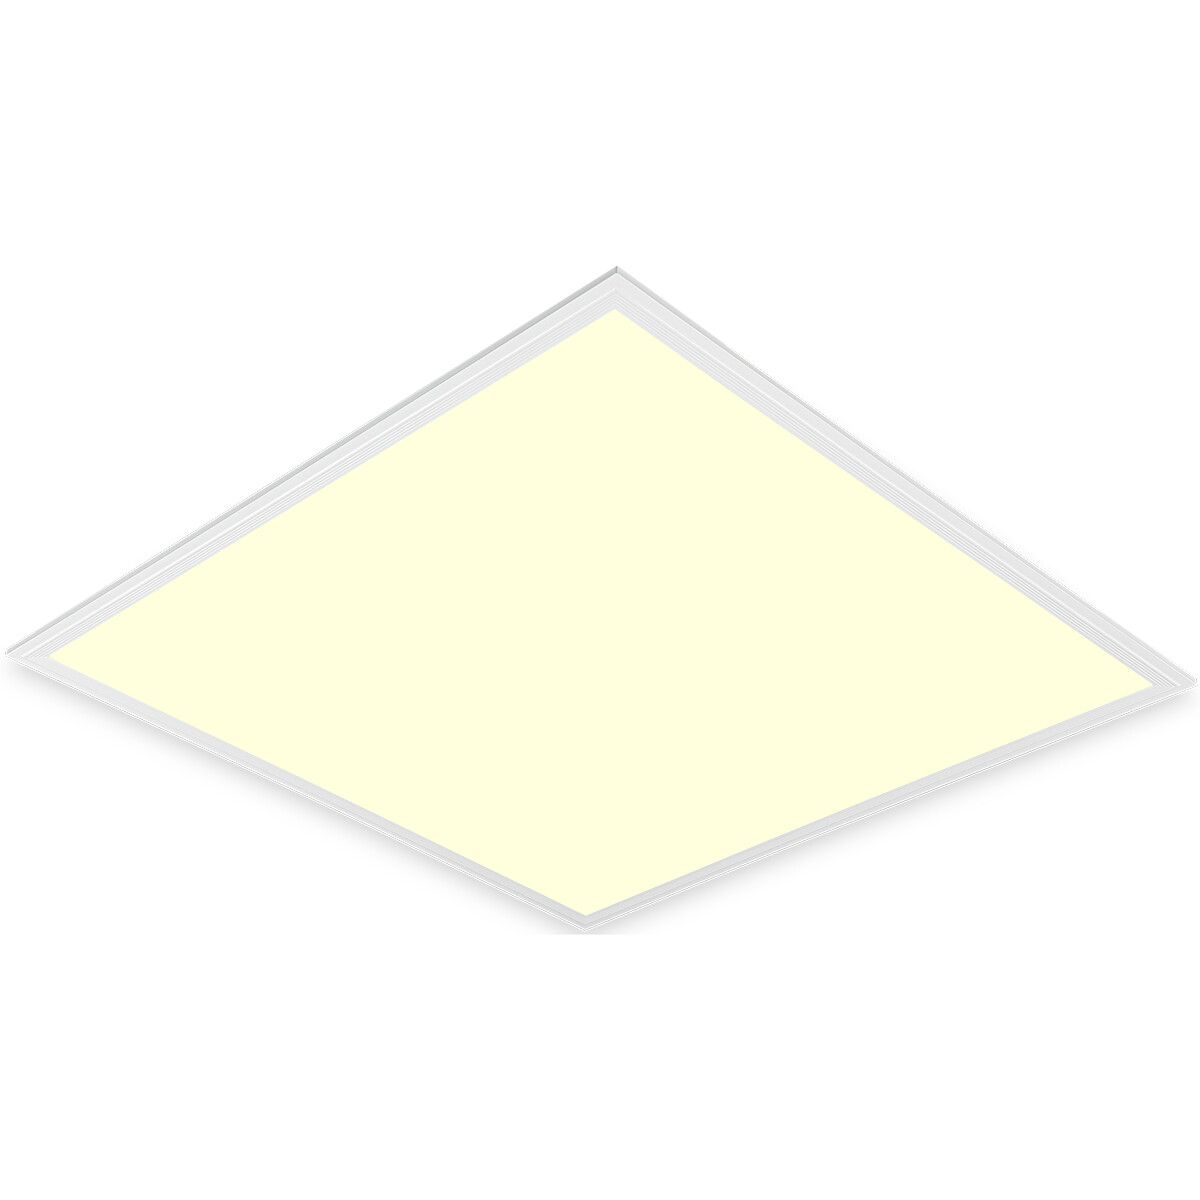 LED Paneel - Aigi Clena - 60x60 Warm Wit 3000K - 40W Inbouw Vierkant - Mat Wit - Flikkervrij